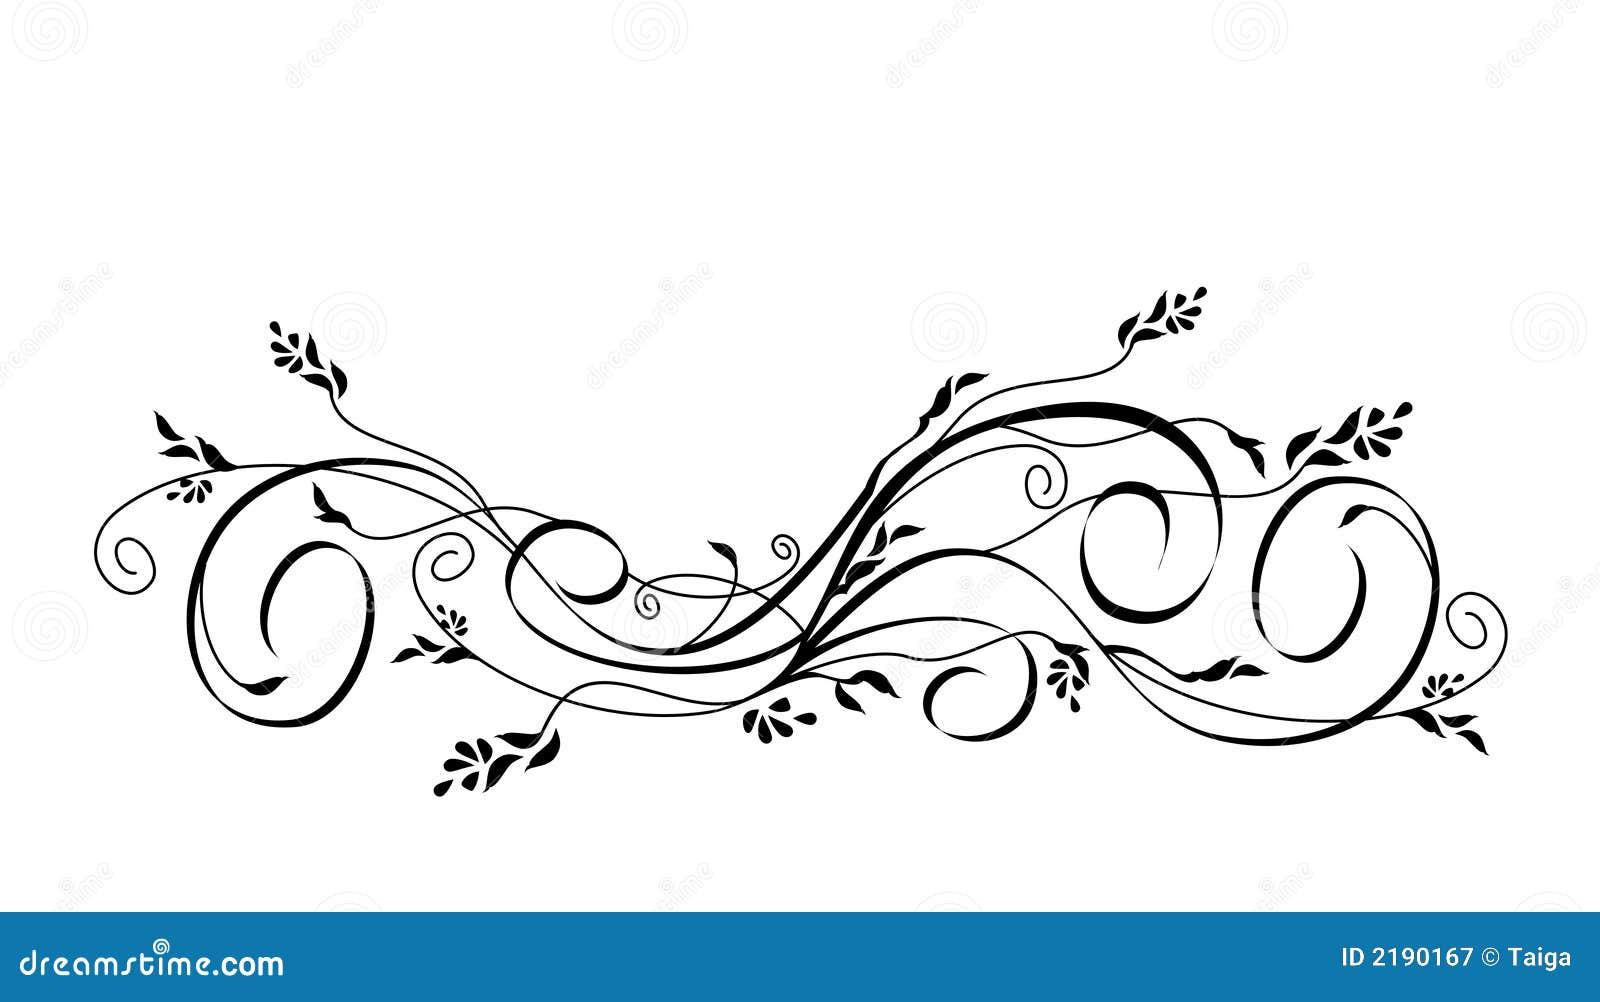 Line Art Designs Free Download : Vector floral scroll ornament stock illustration